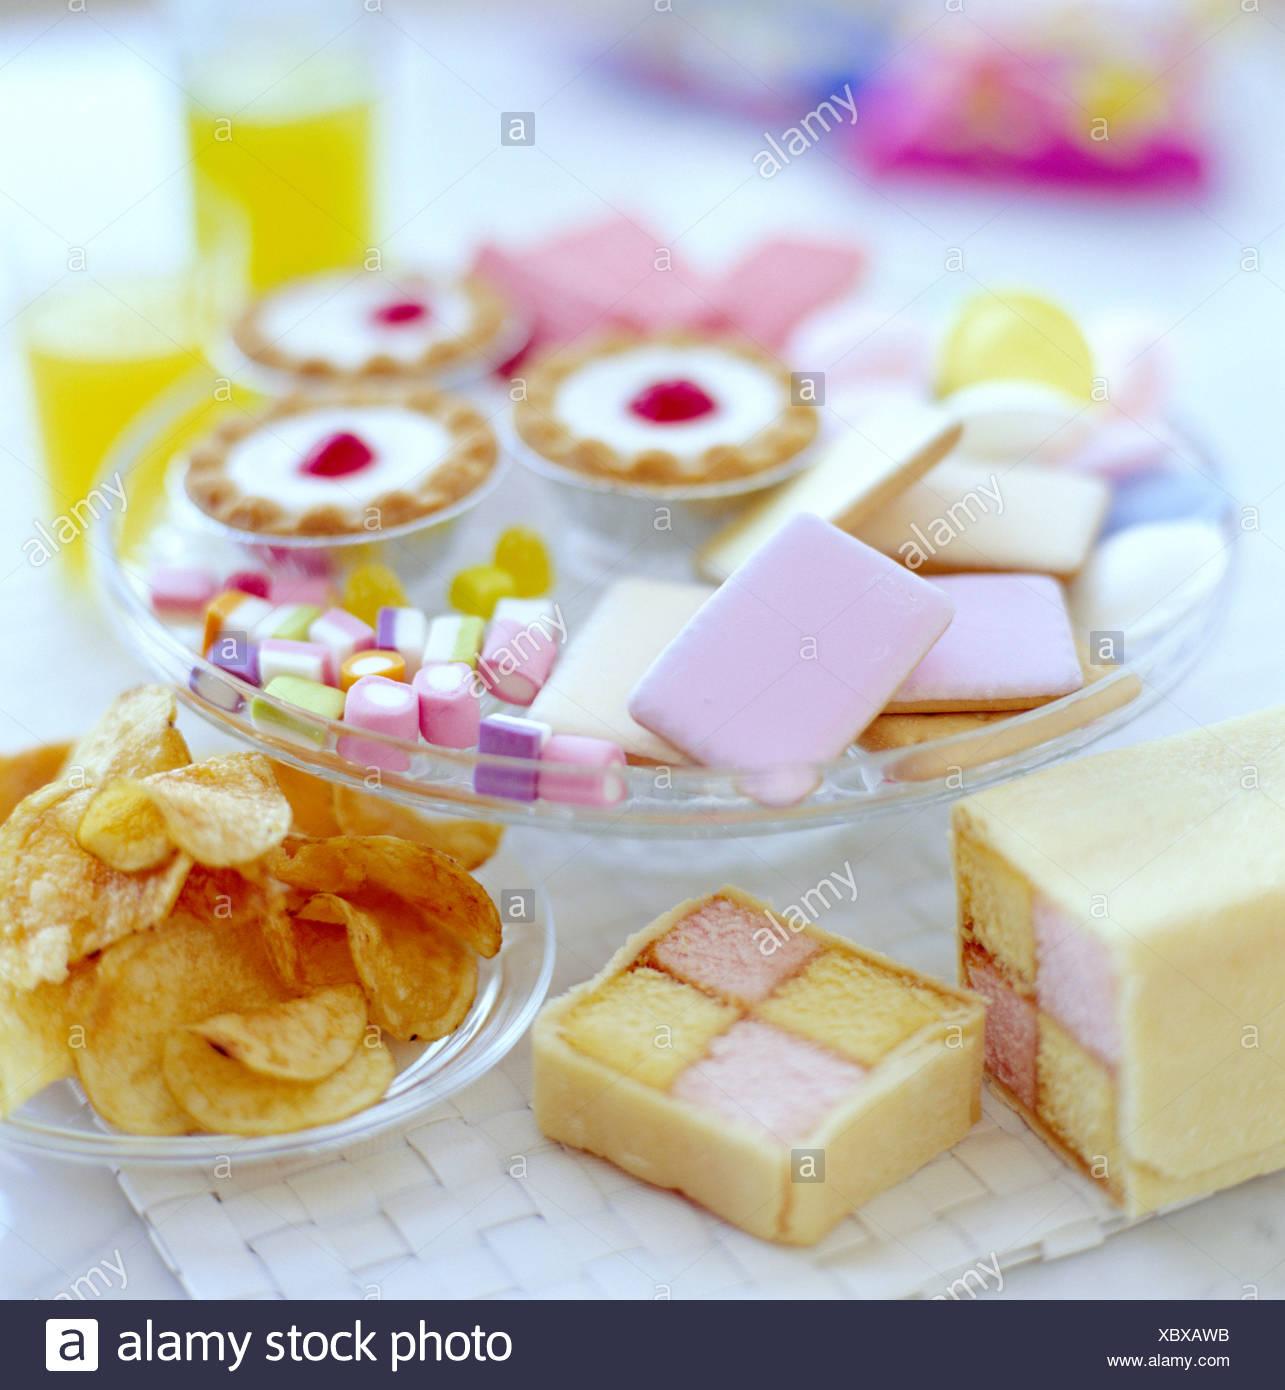 Processed Foods Stockfotos & Processed Foods Bilder - Alamy